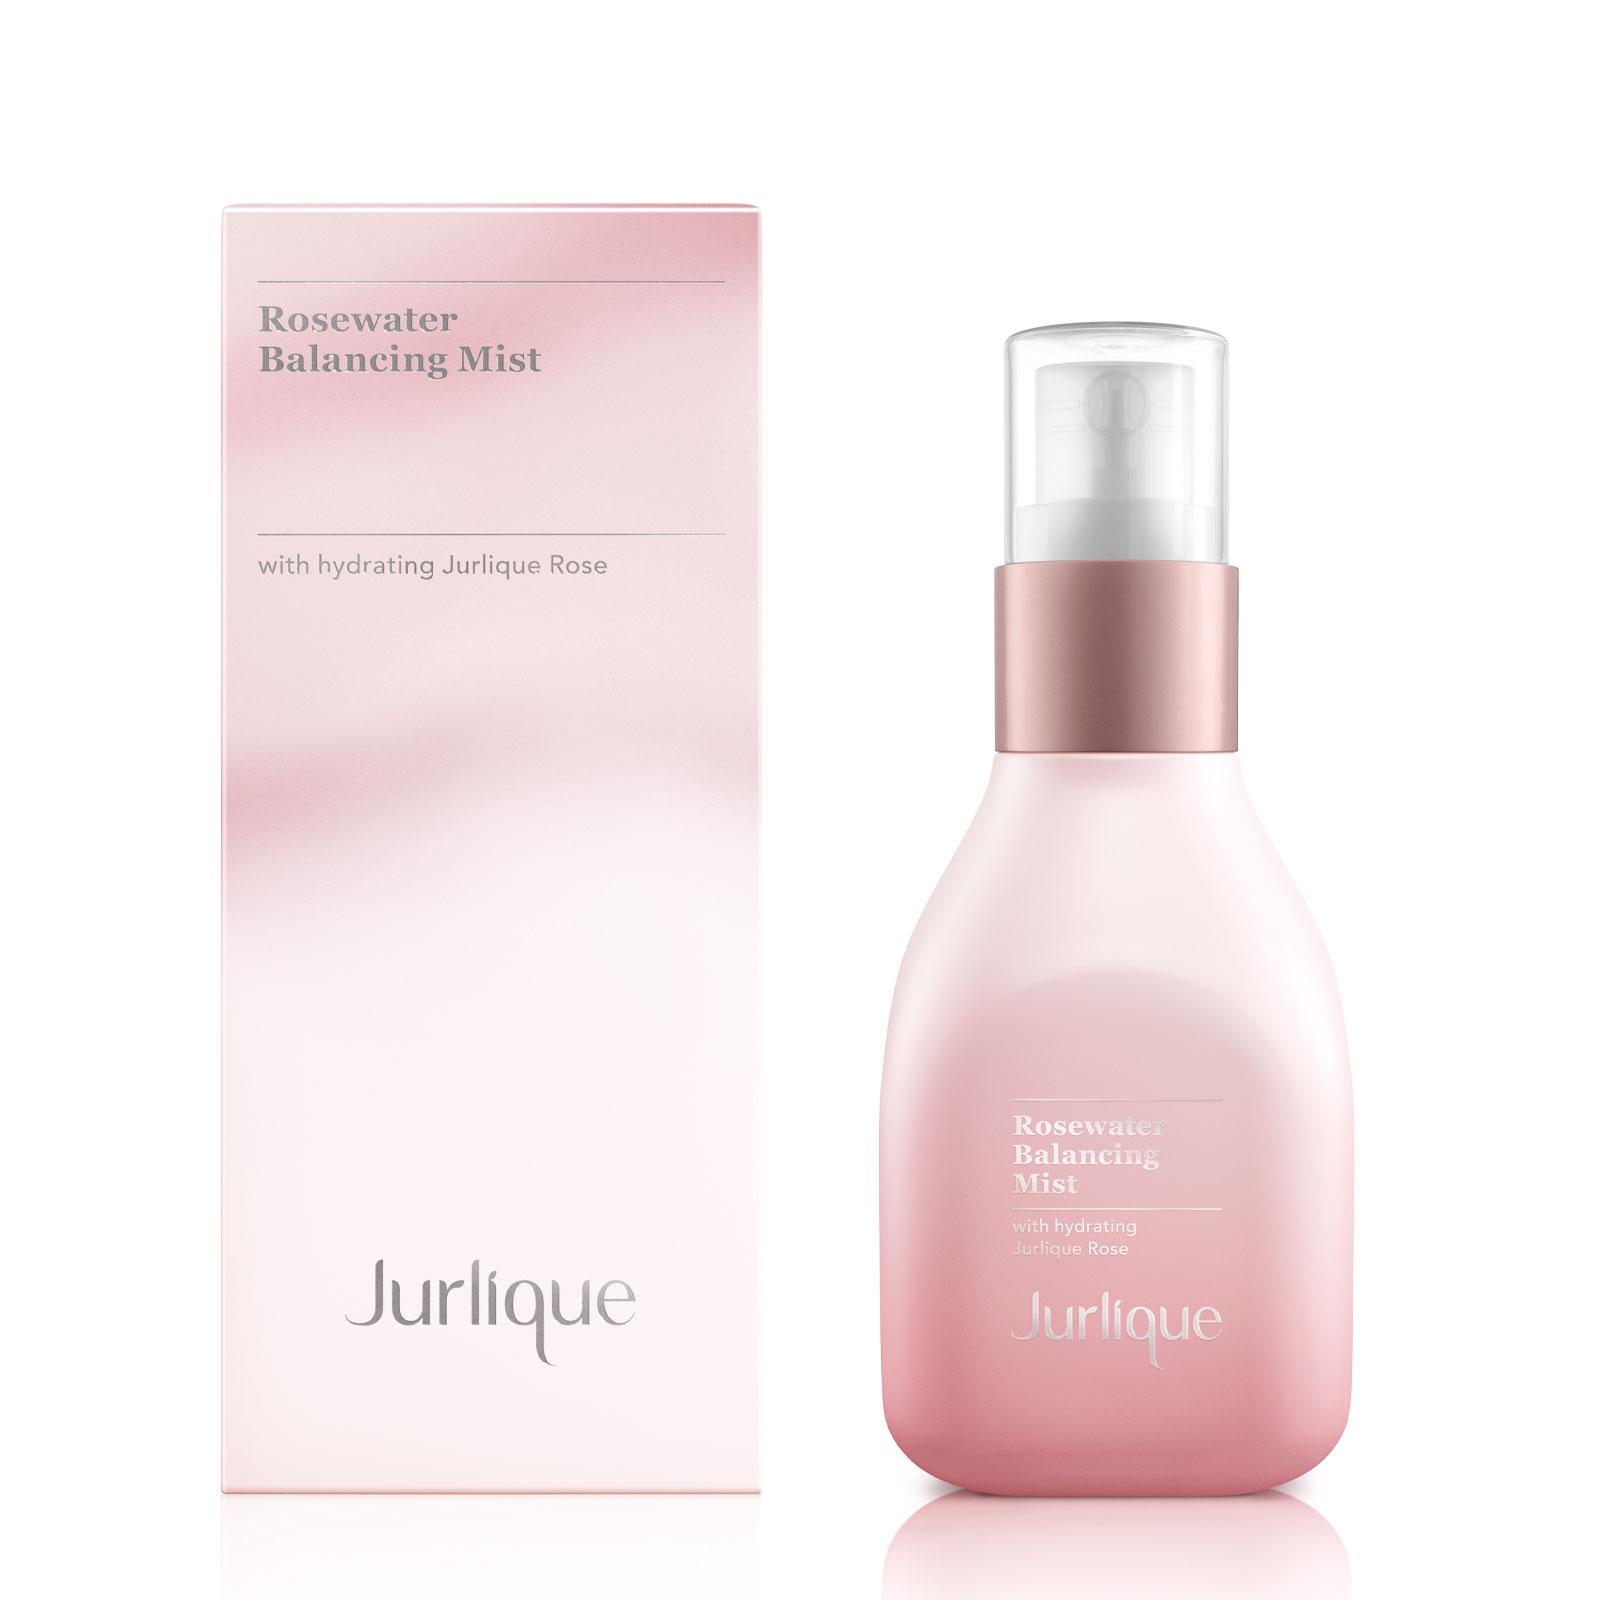 Jurlique 茱莉蔻 玫瑰水平衡护肤喷雾 50ml